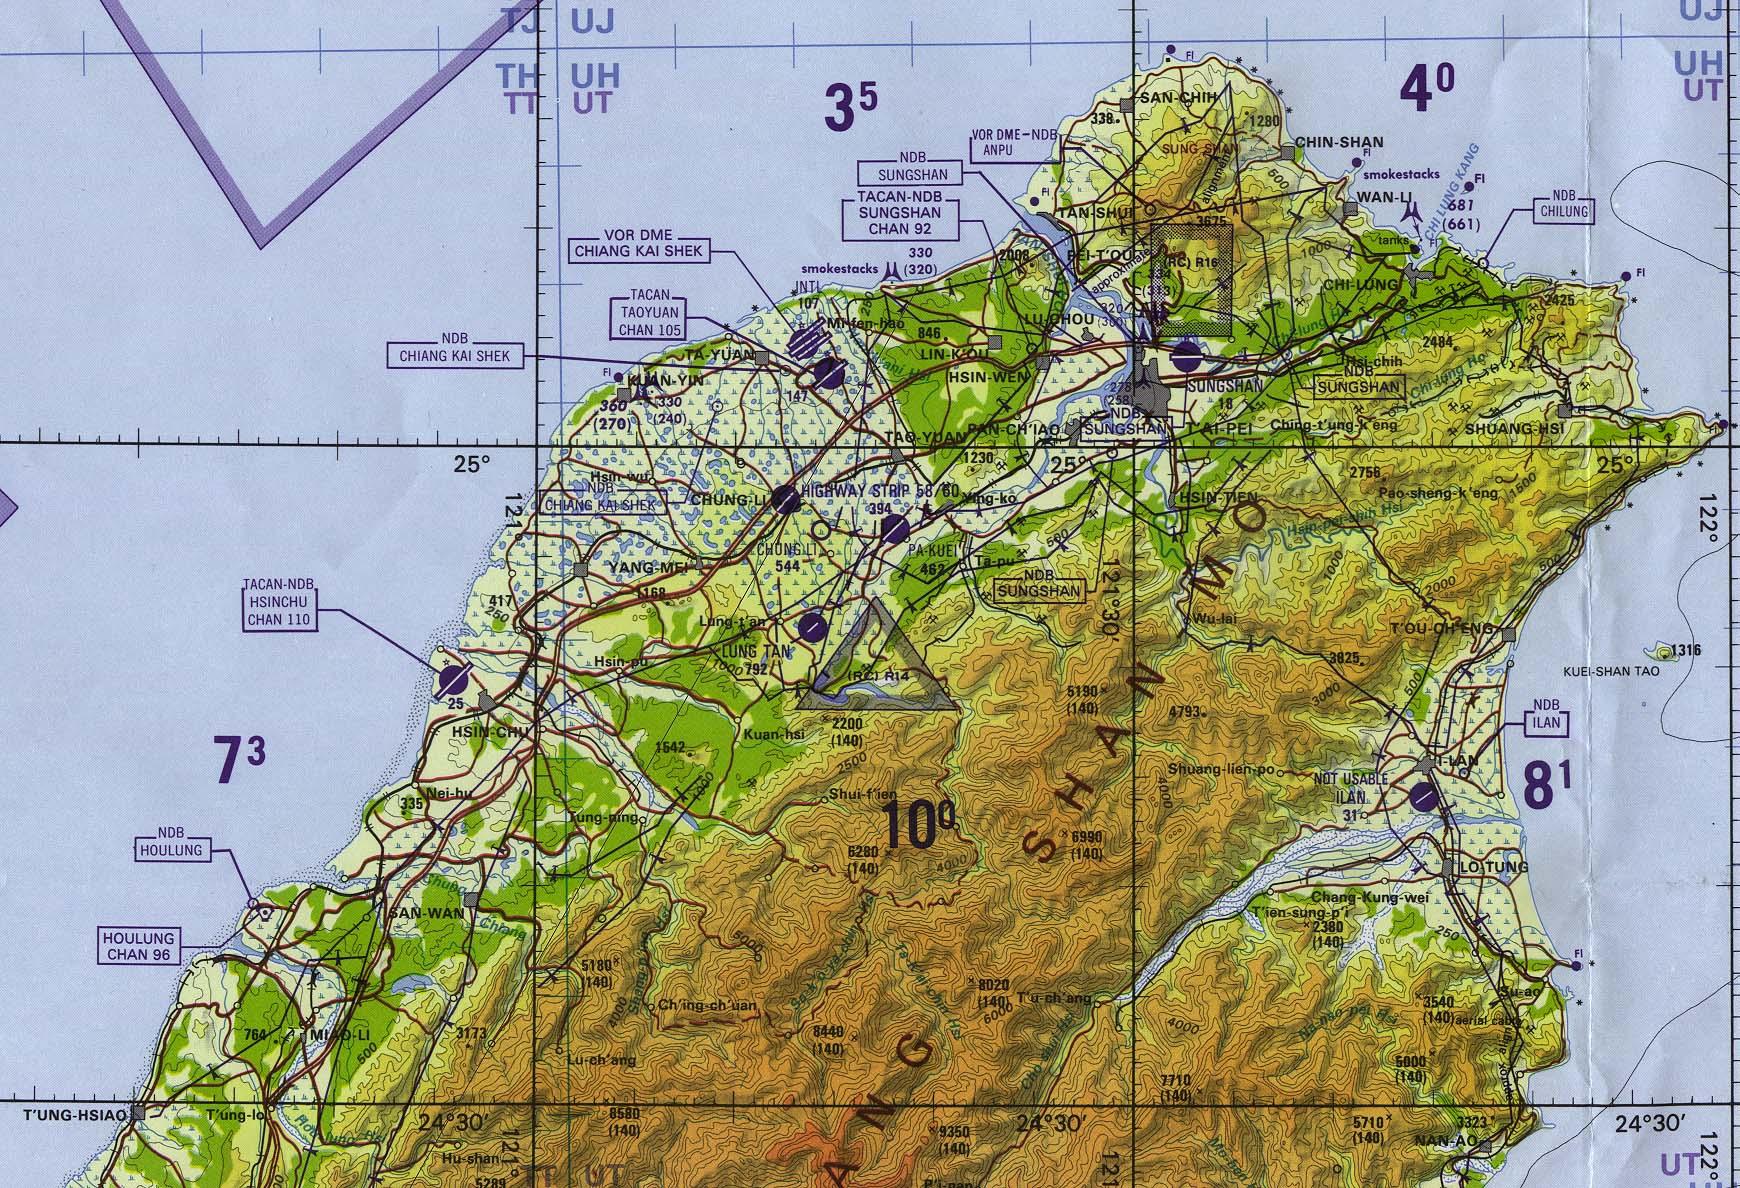 Reisenett China Maps - Us government map of mongolia 1 500000